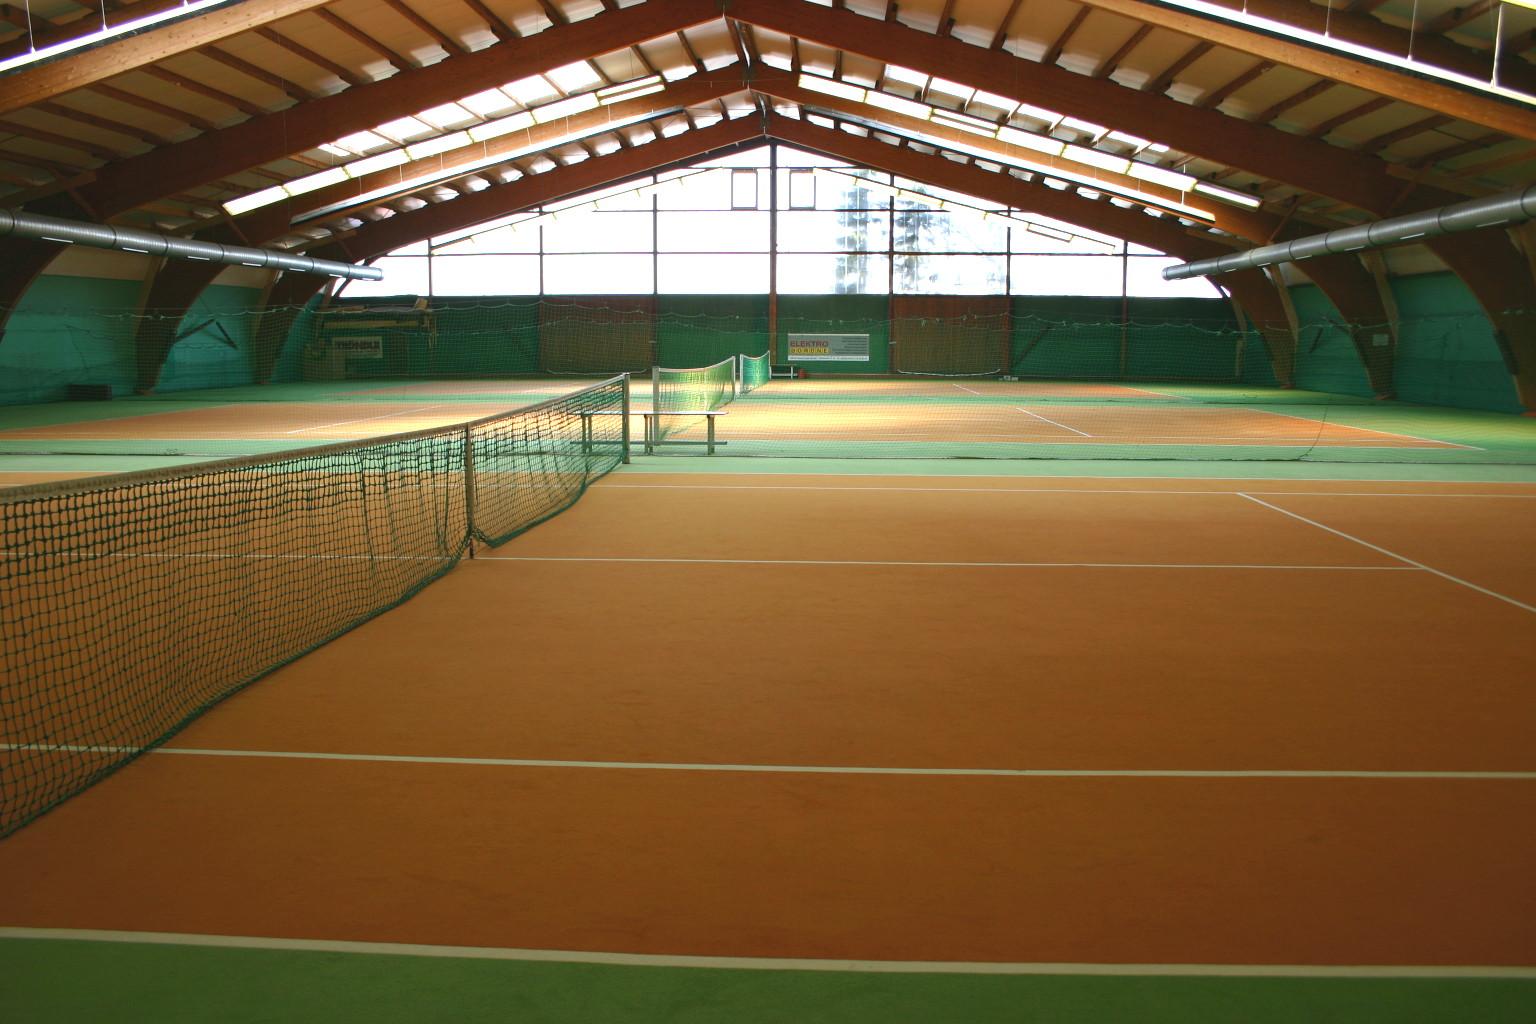 Granulatplätze für Tennis des Tröndle Sportcenters